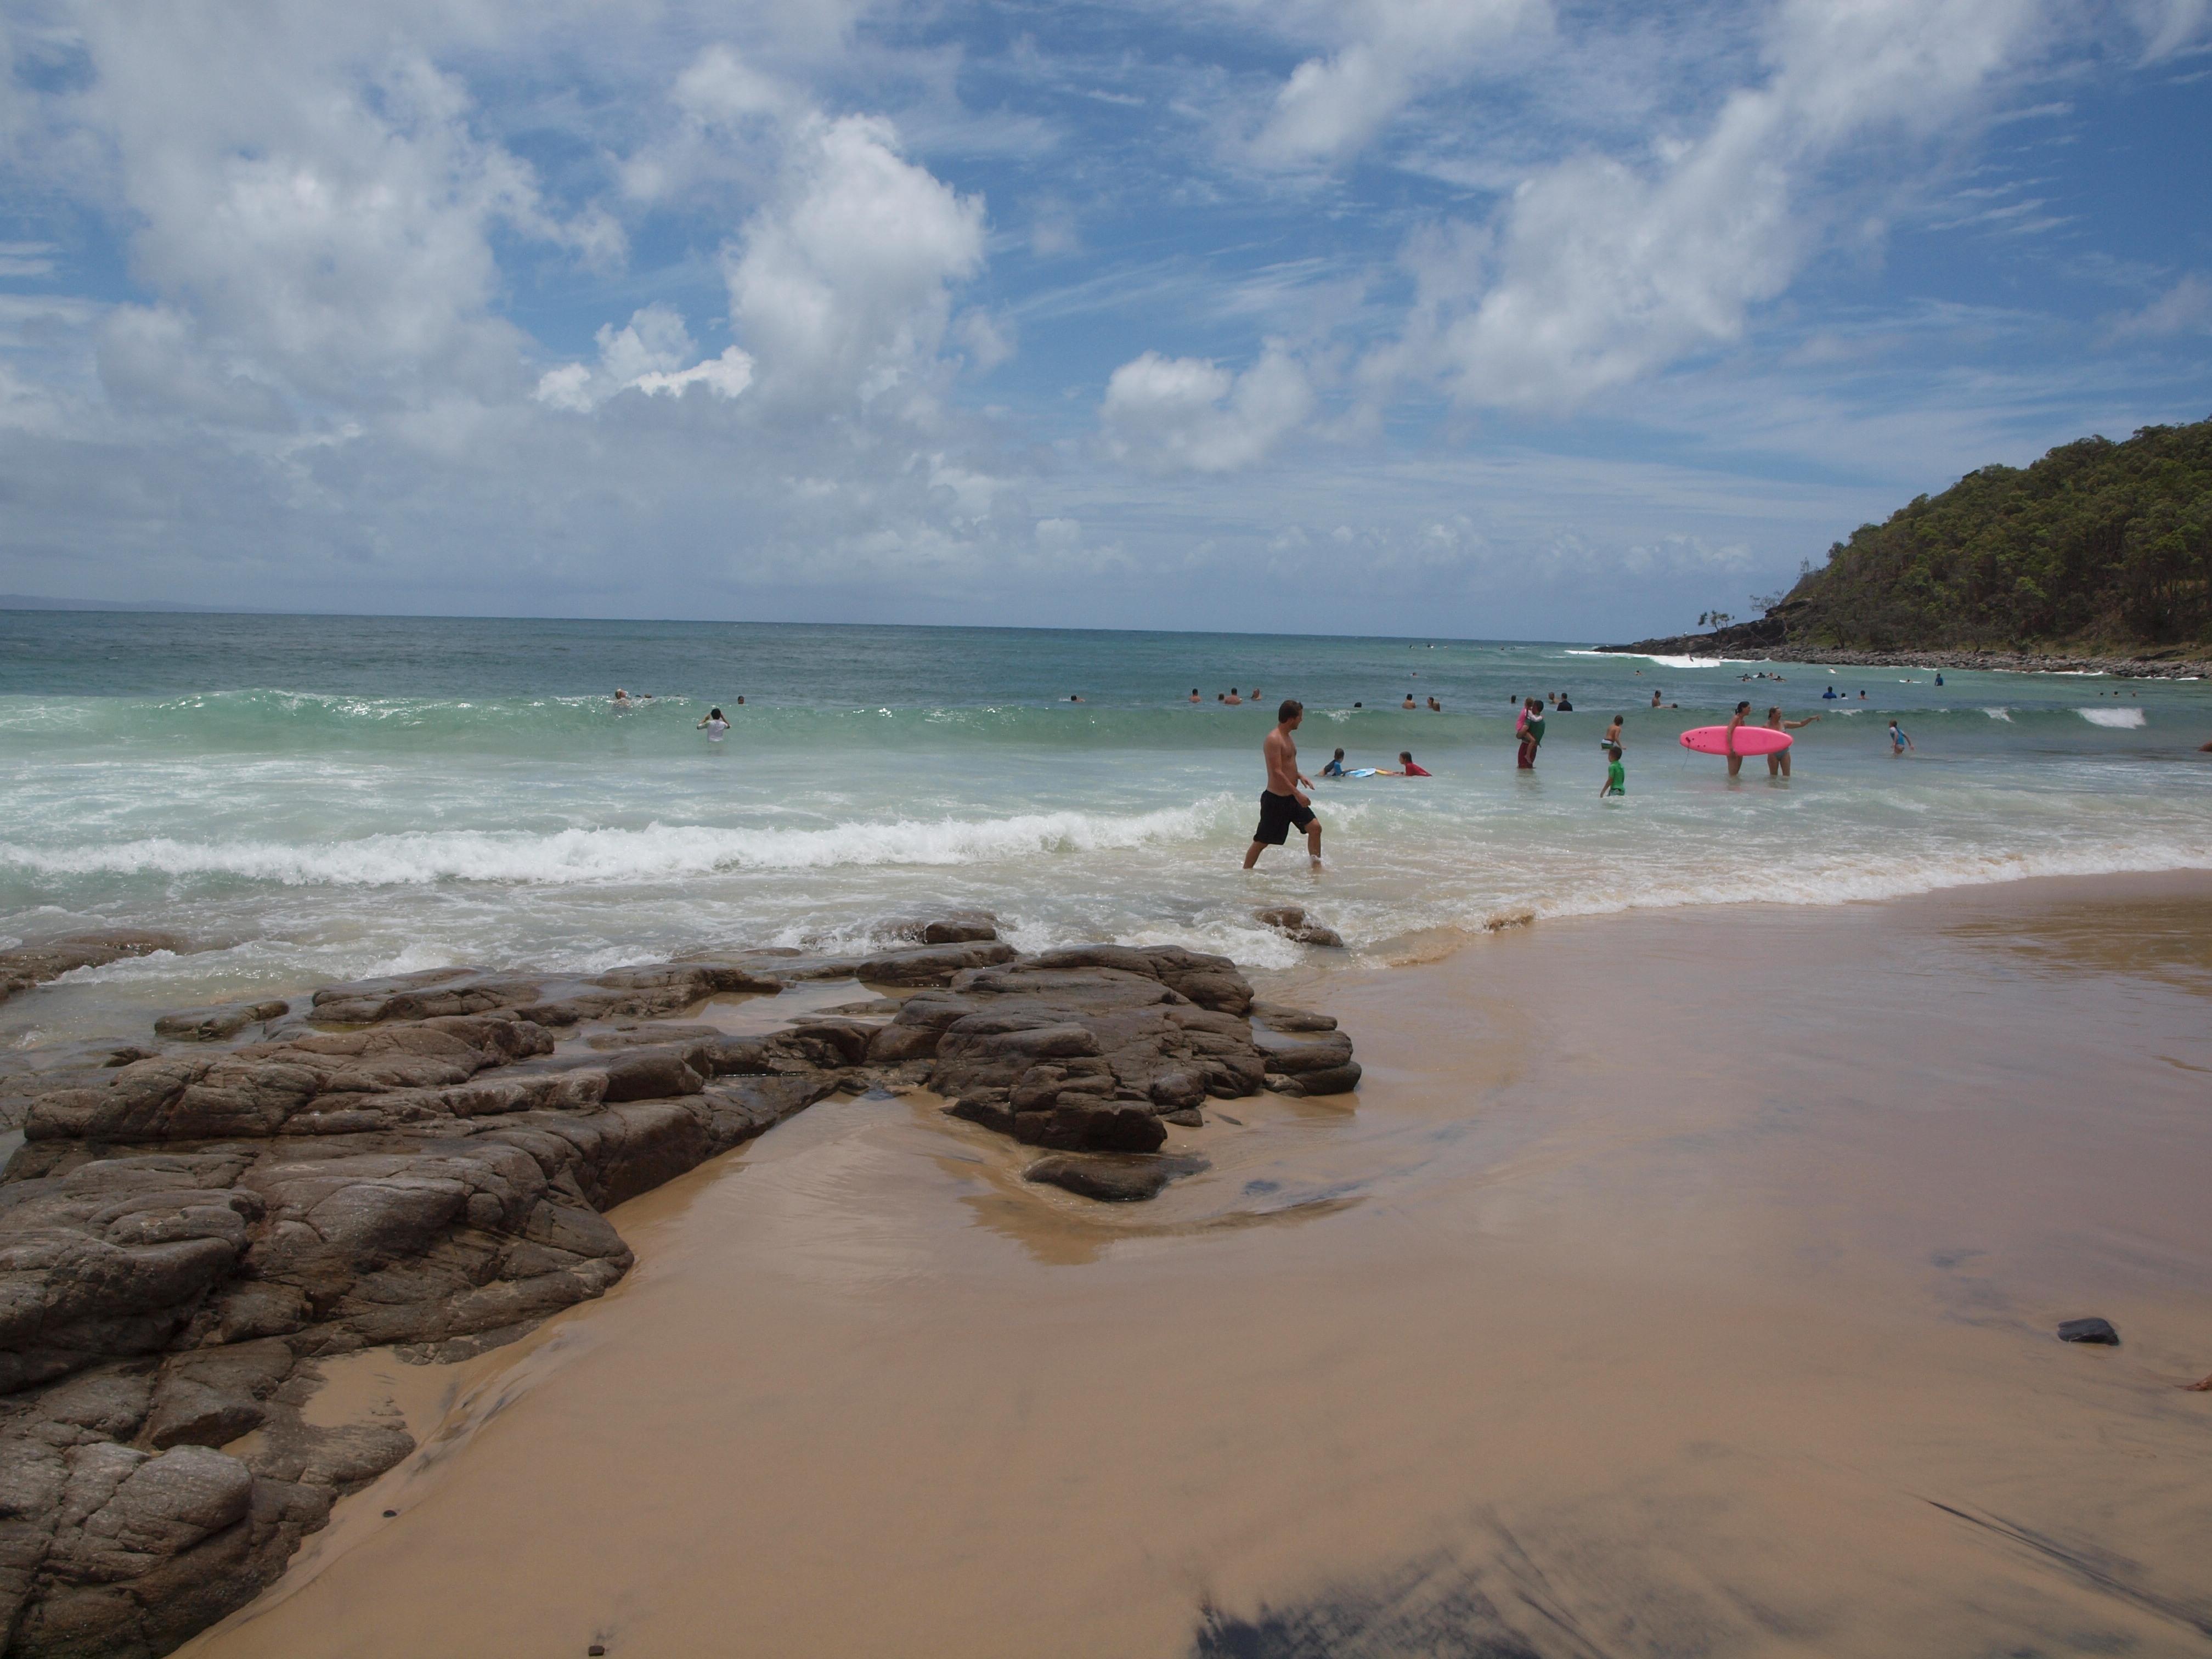 Anna McGregor - Tea Tree Bay, Nooa Sunshine Coast